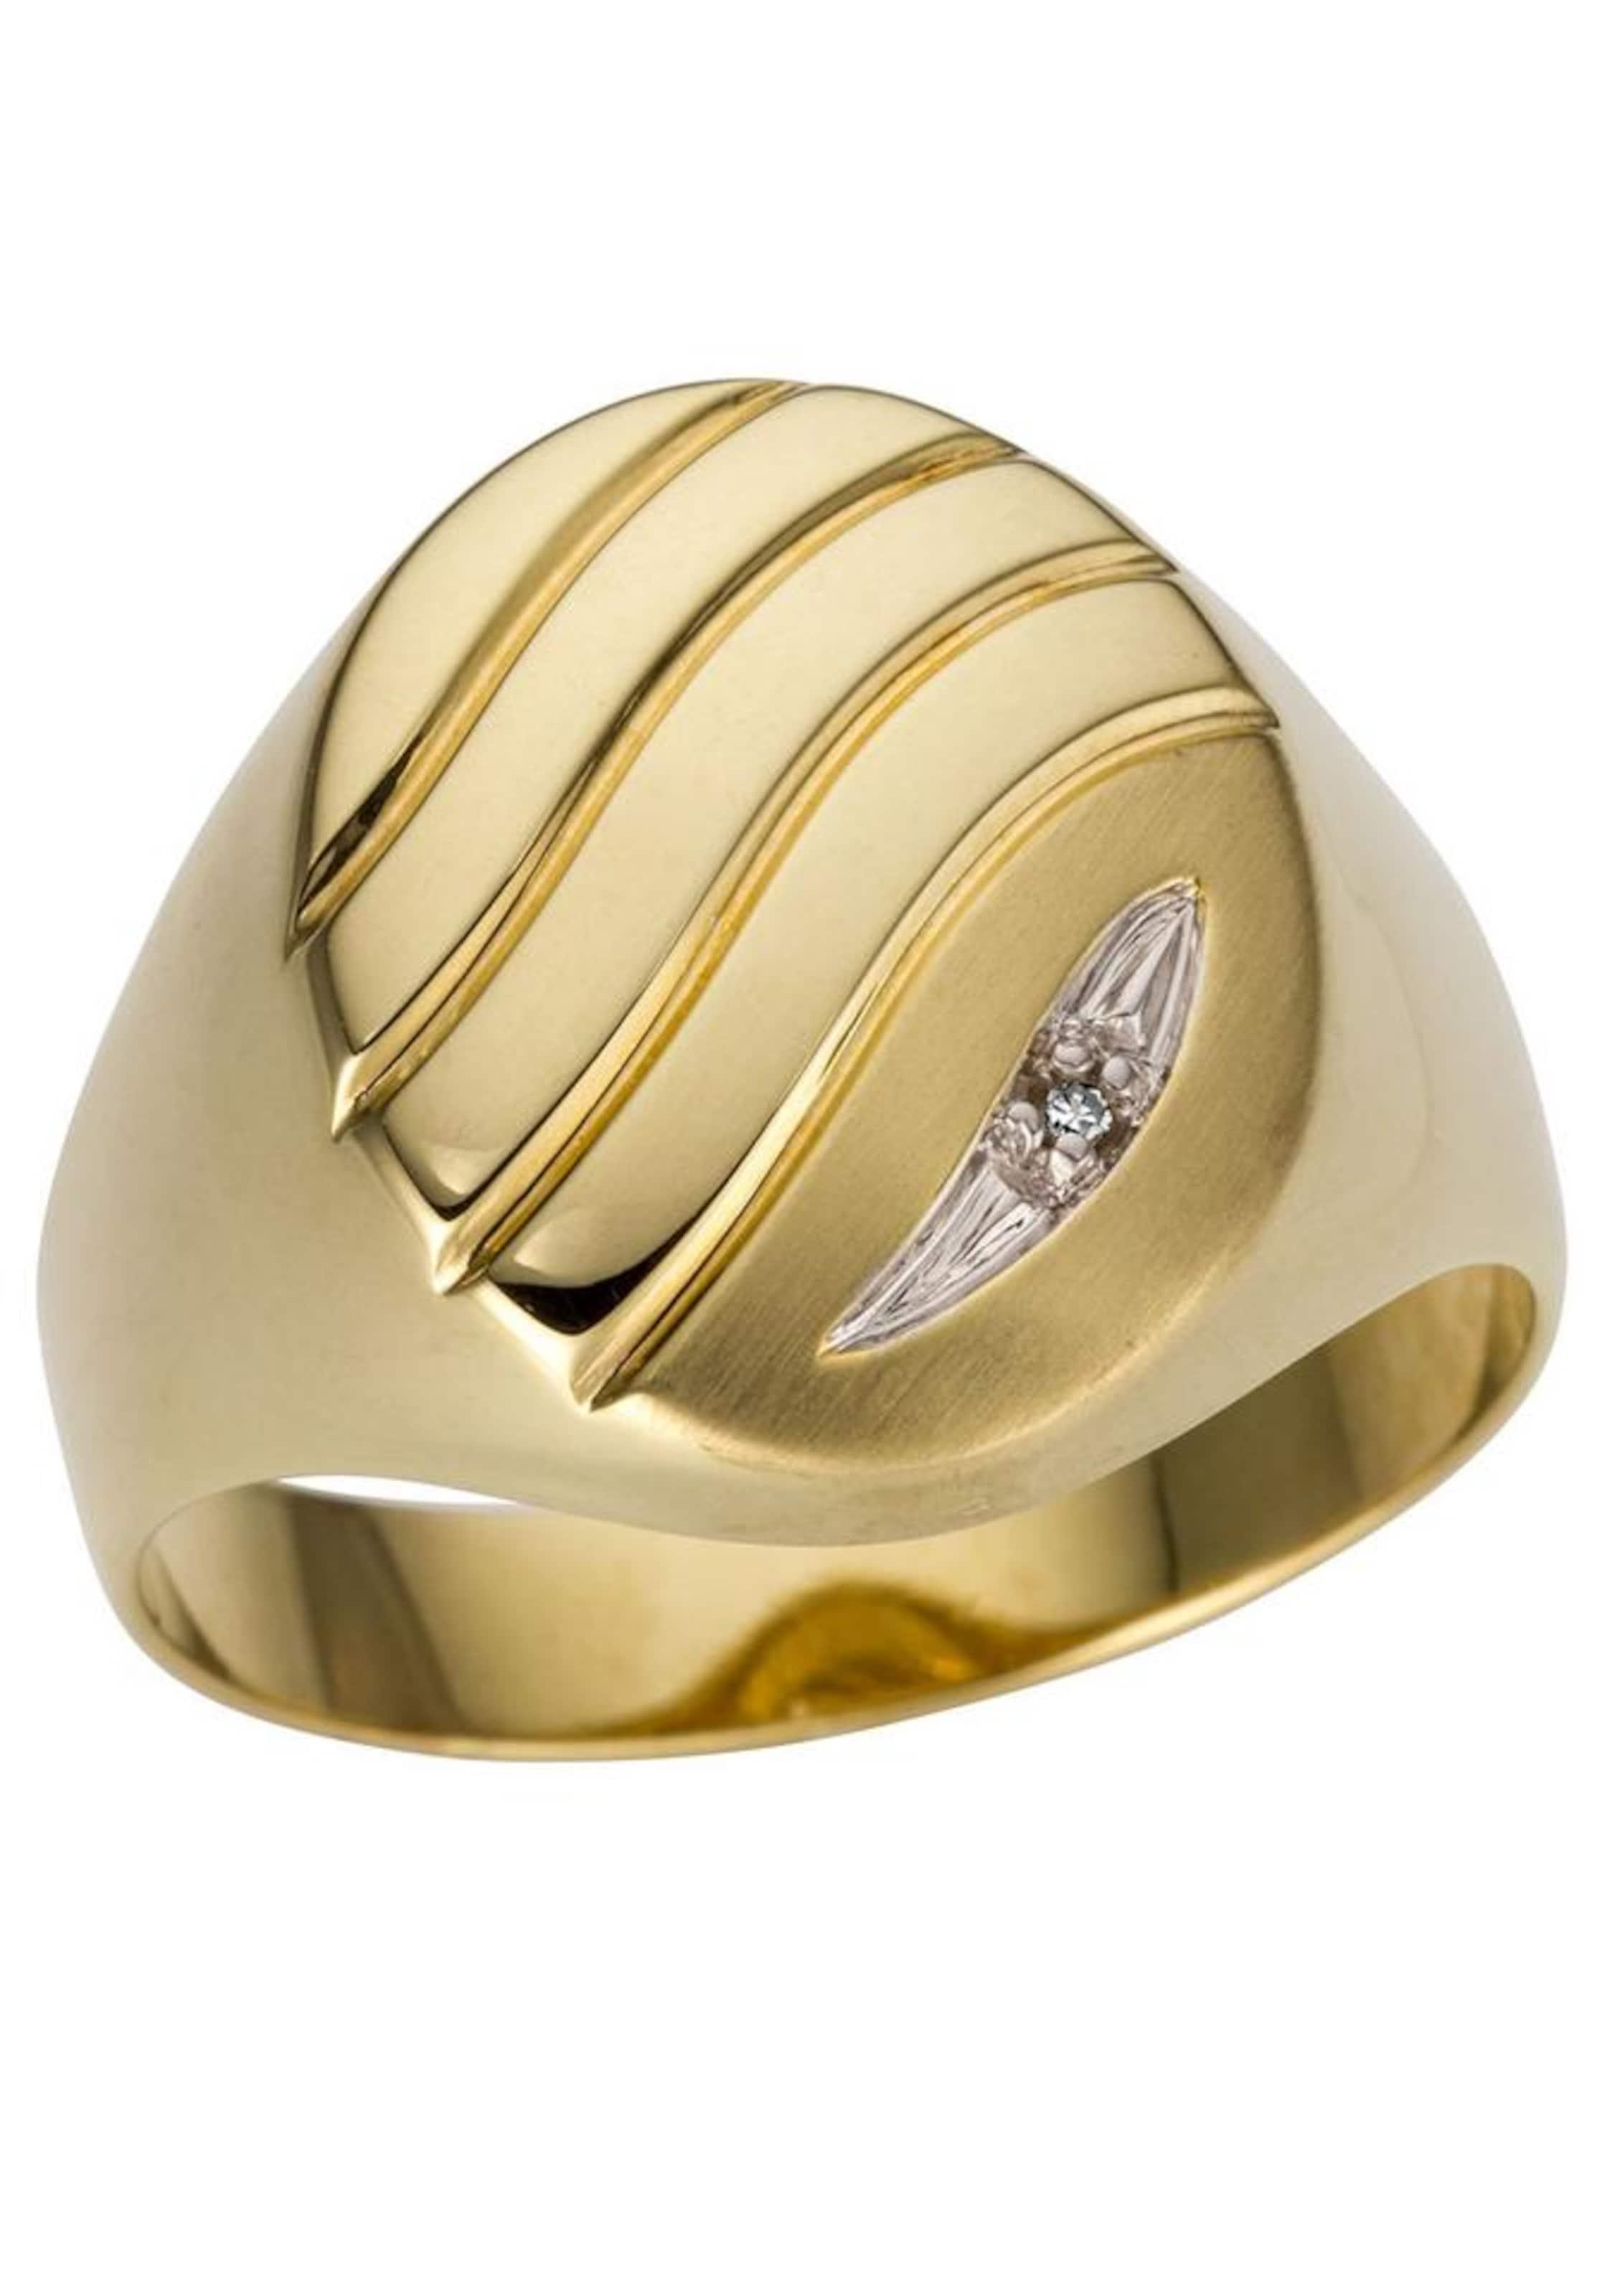 Rillen' 'glanzMattRingkopf GoldSilber Goldring Mit In Firetti m0wOvnN8